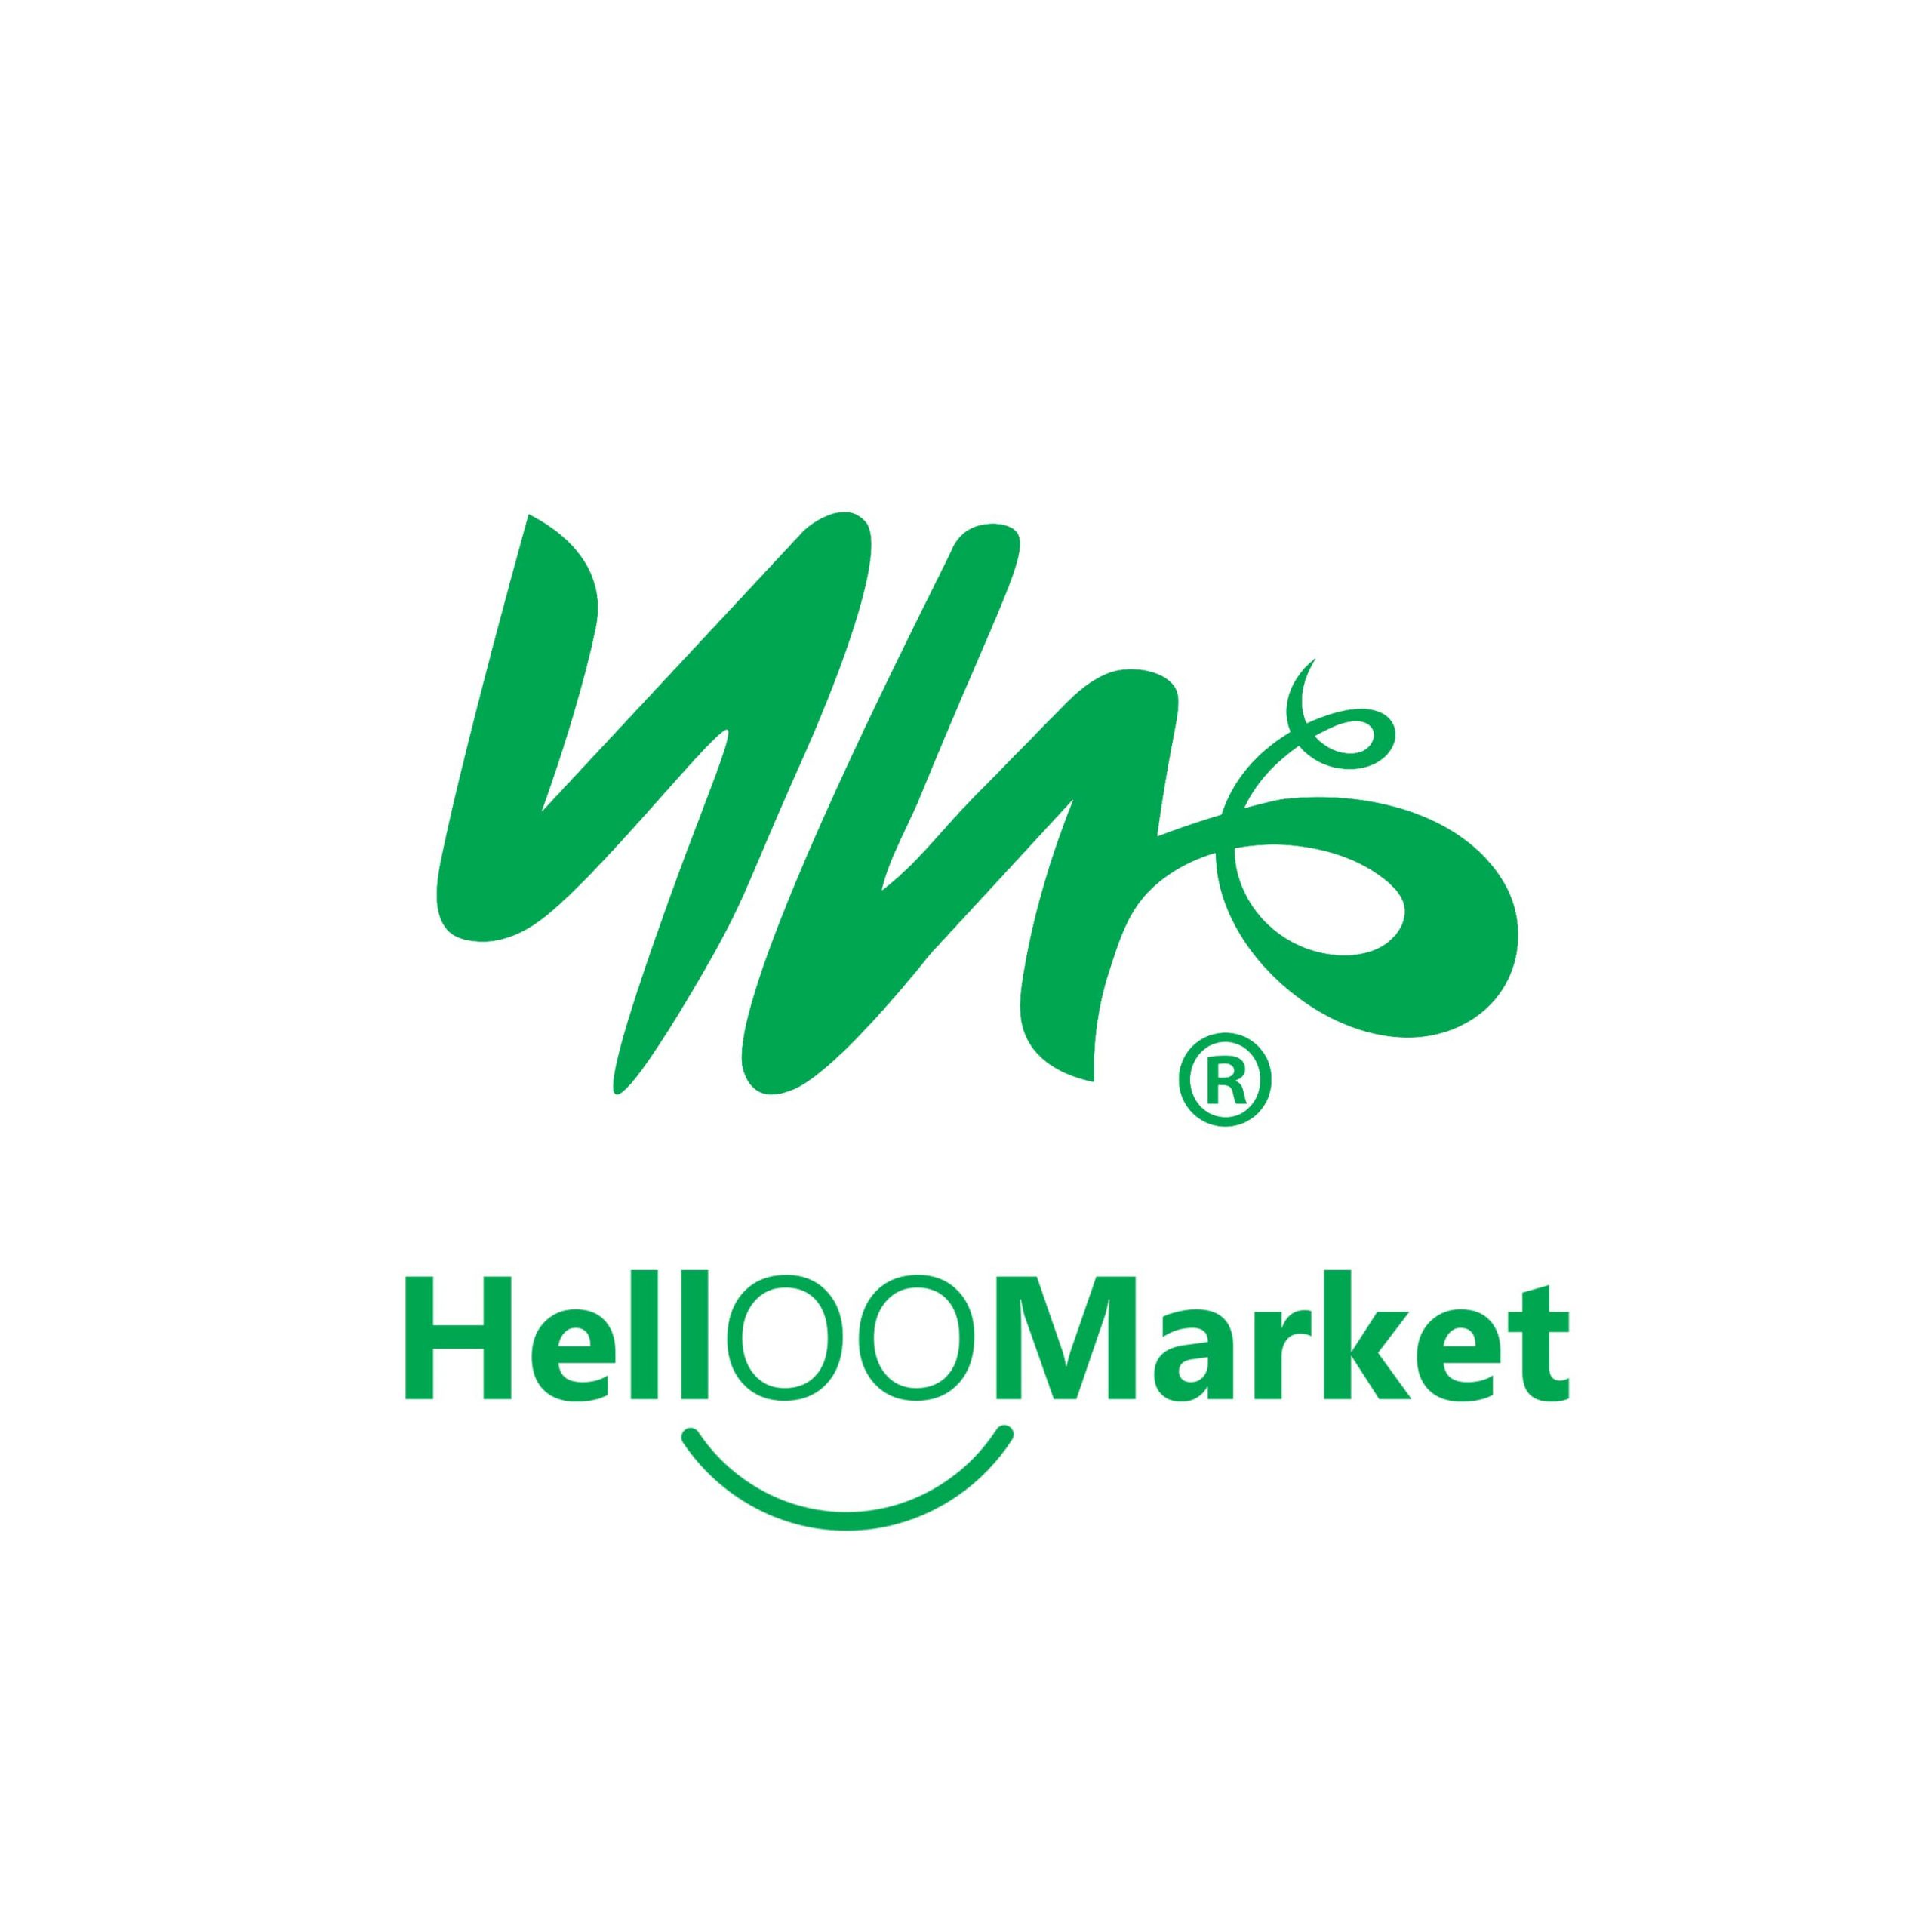 Halo market